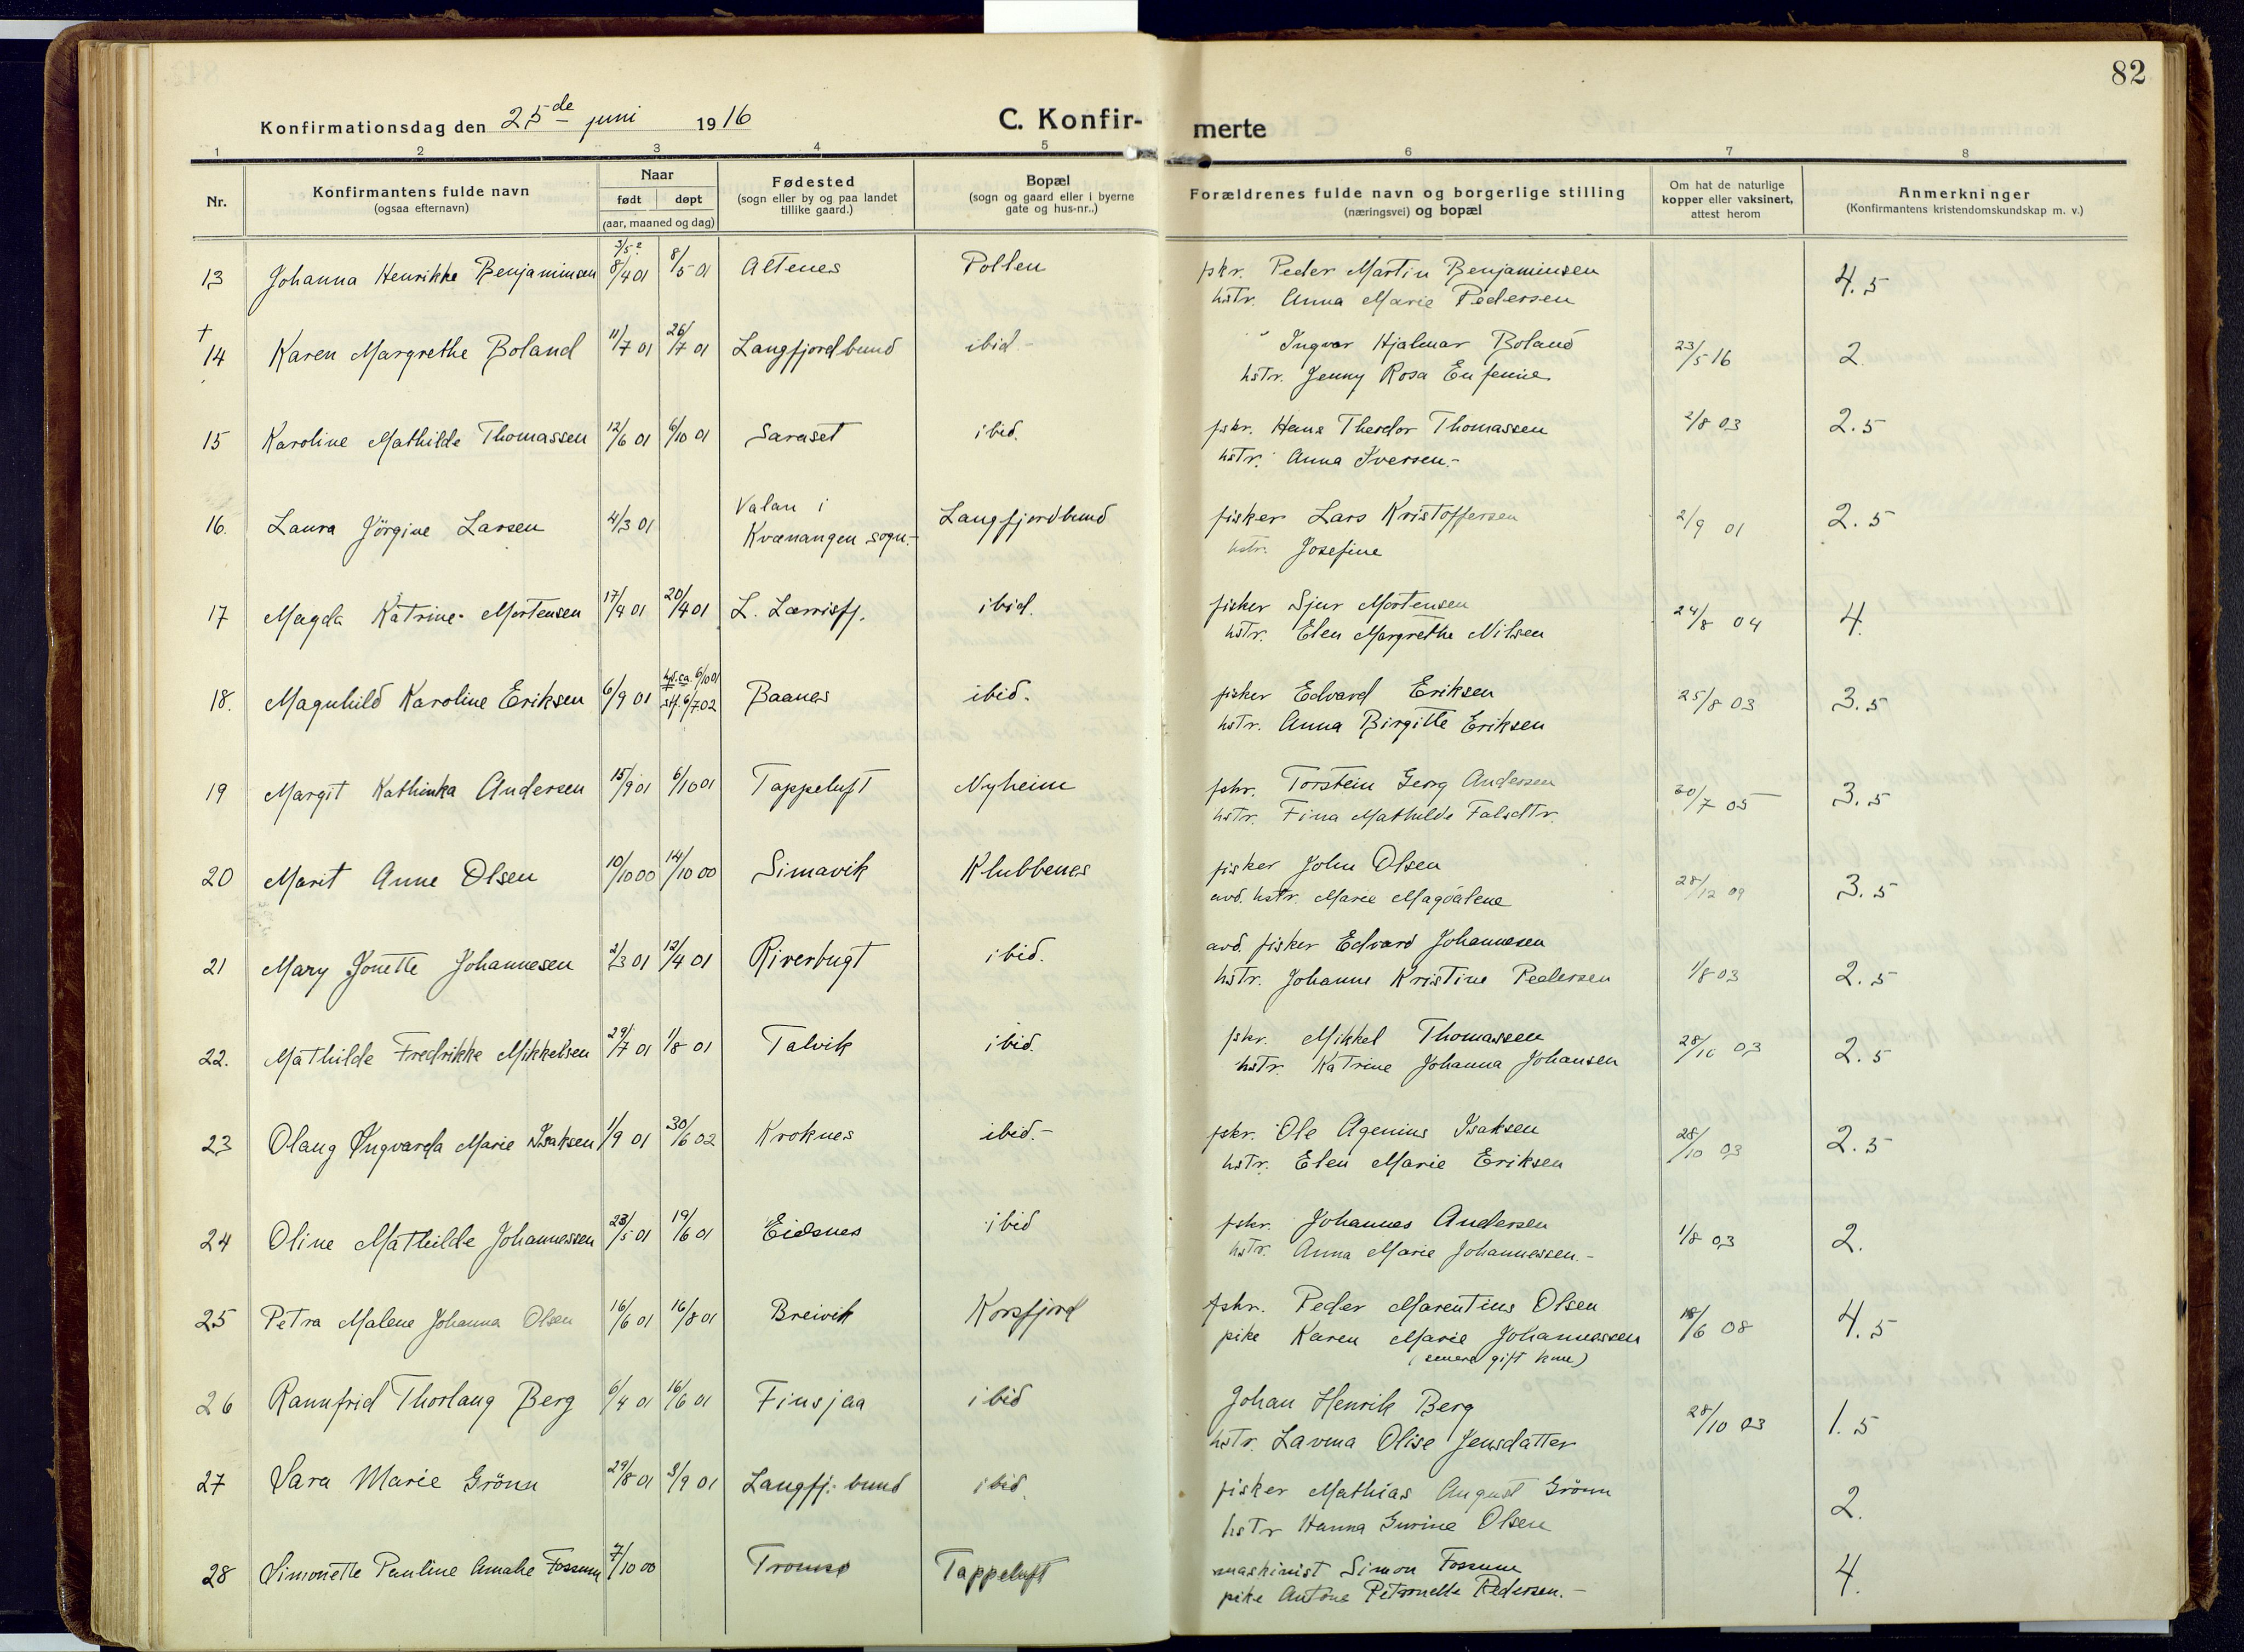 SATØ, Talvik sokneprestkontor, H/Ha/L0018kirke: Ministerialbok nr. 18, 1915-1924, s. 82